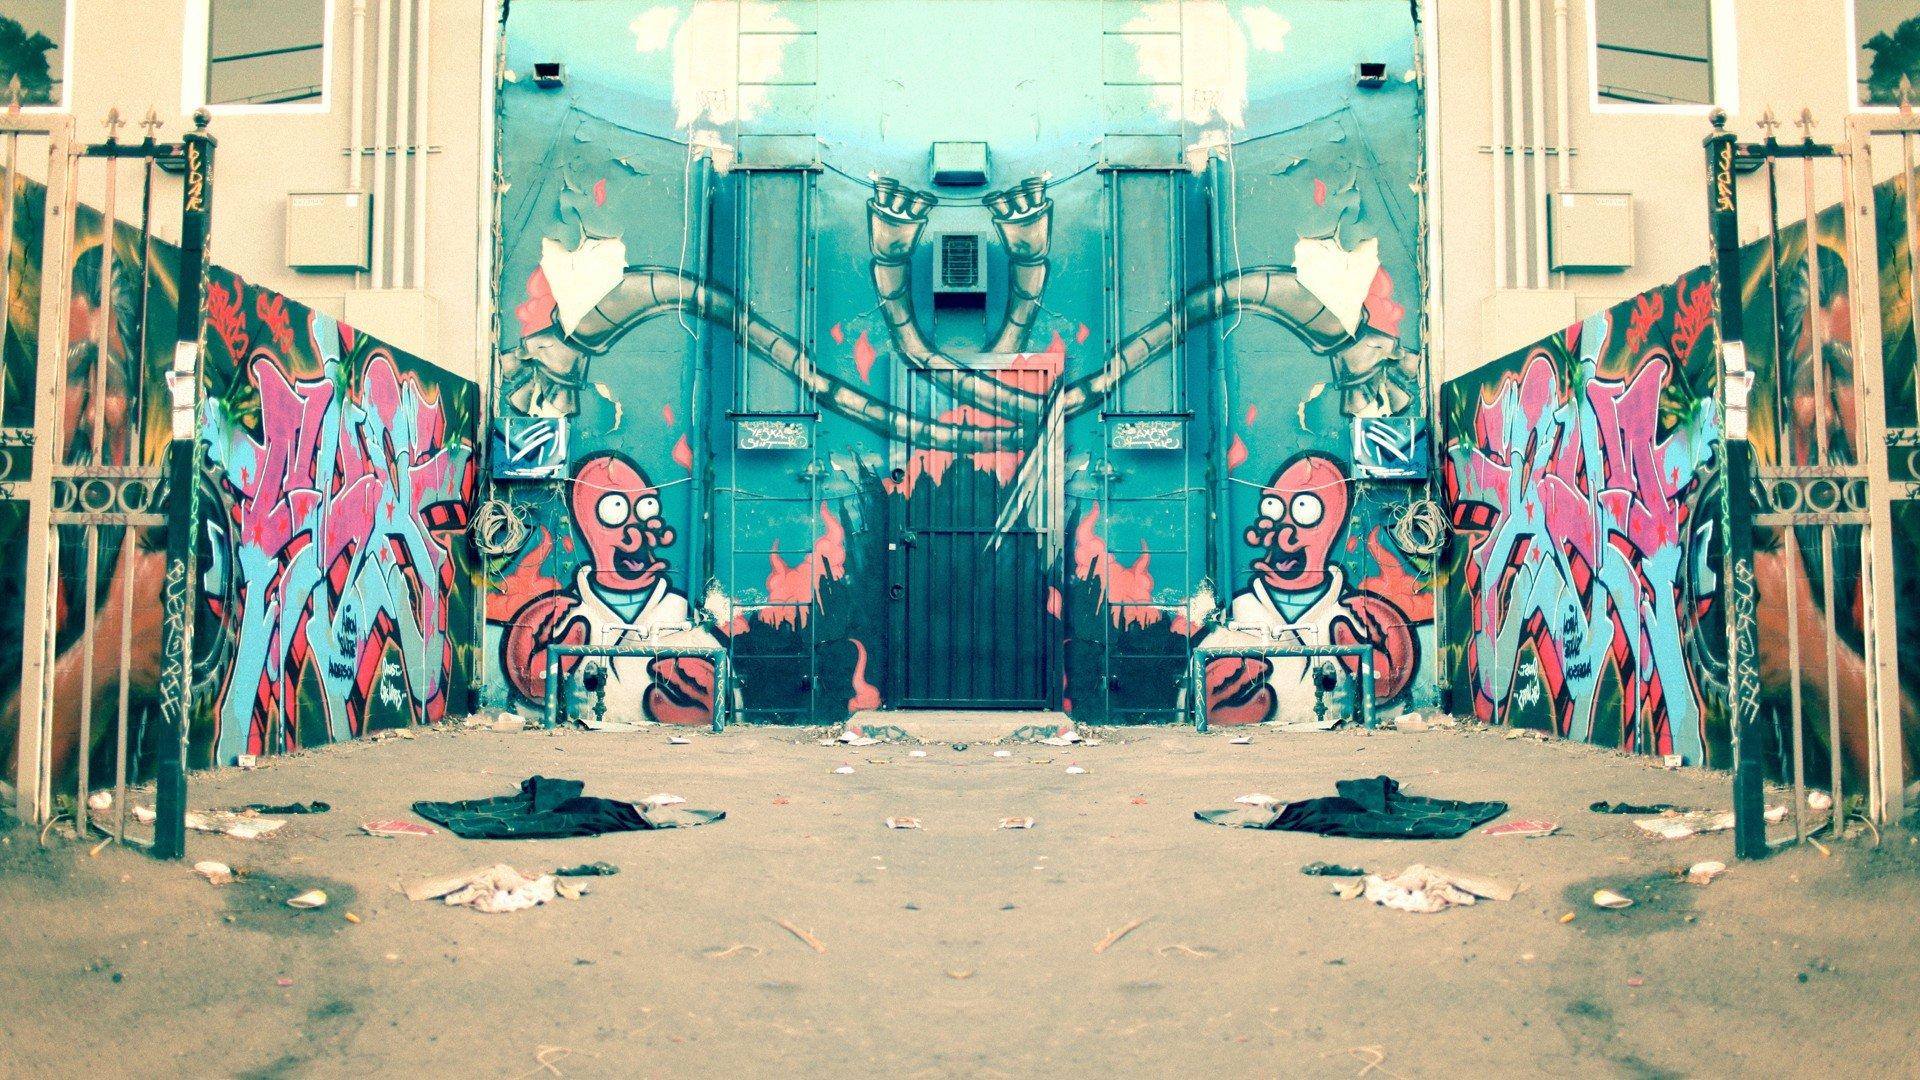 Futurama Bender Mirrors Graffiti Dr Zoidberg Street Art